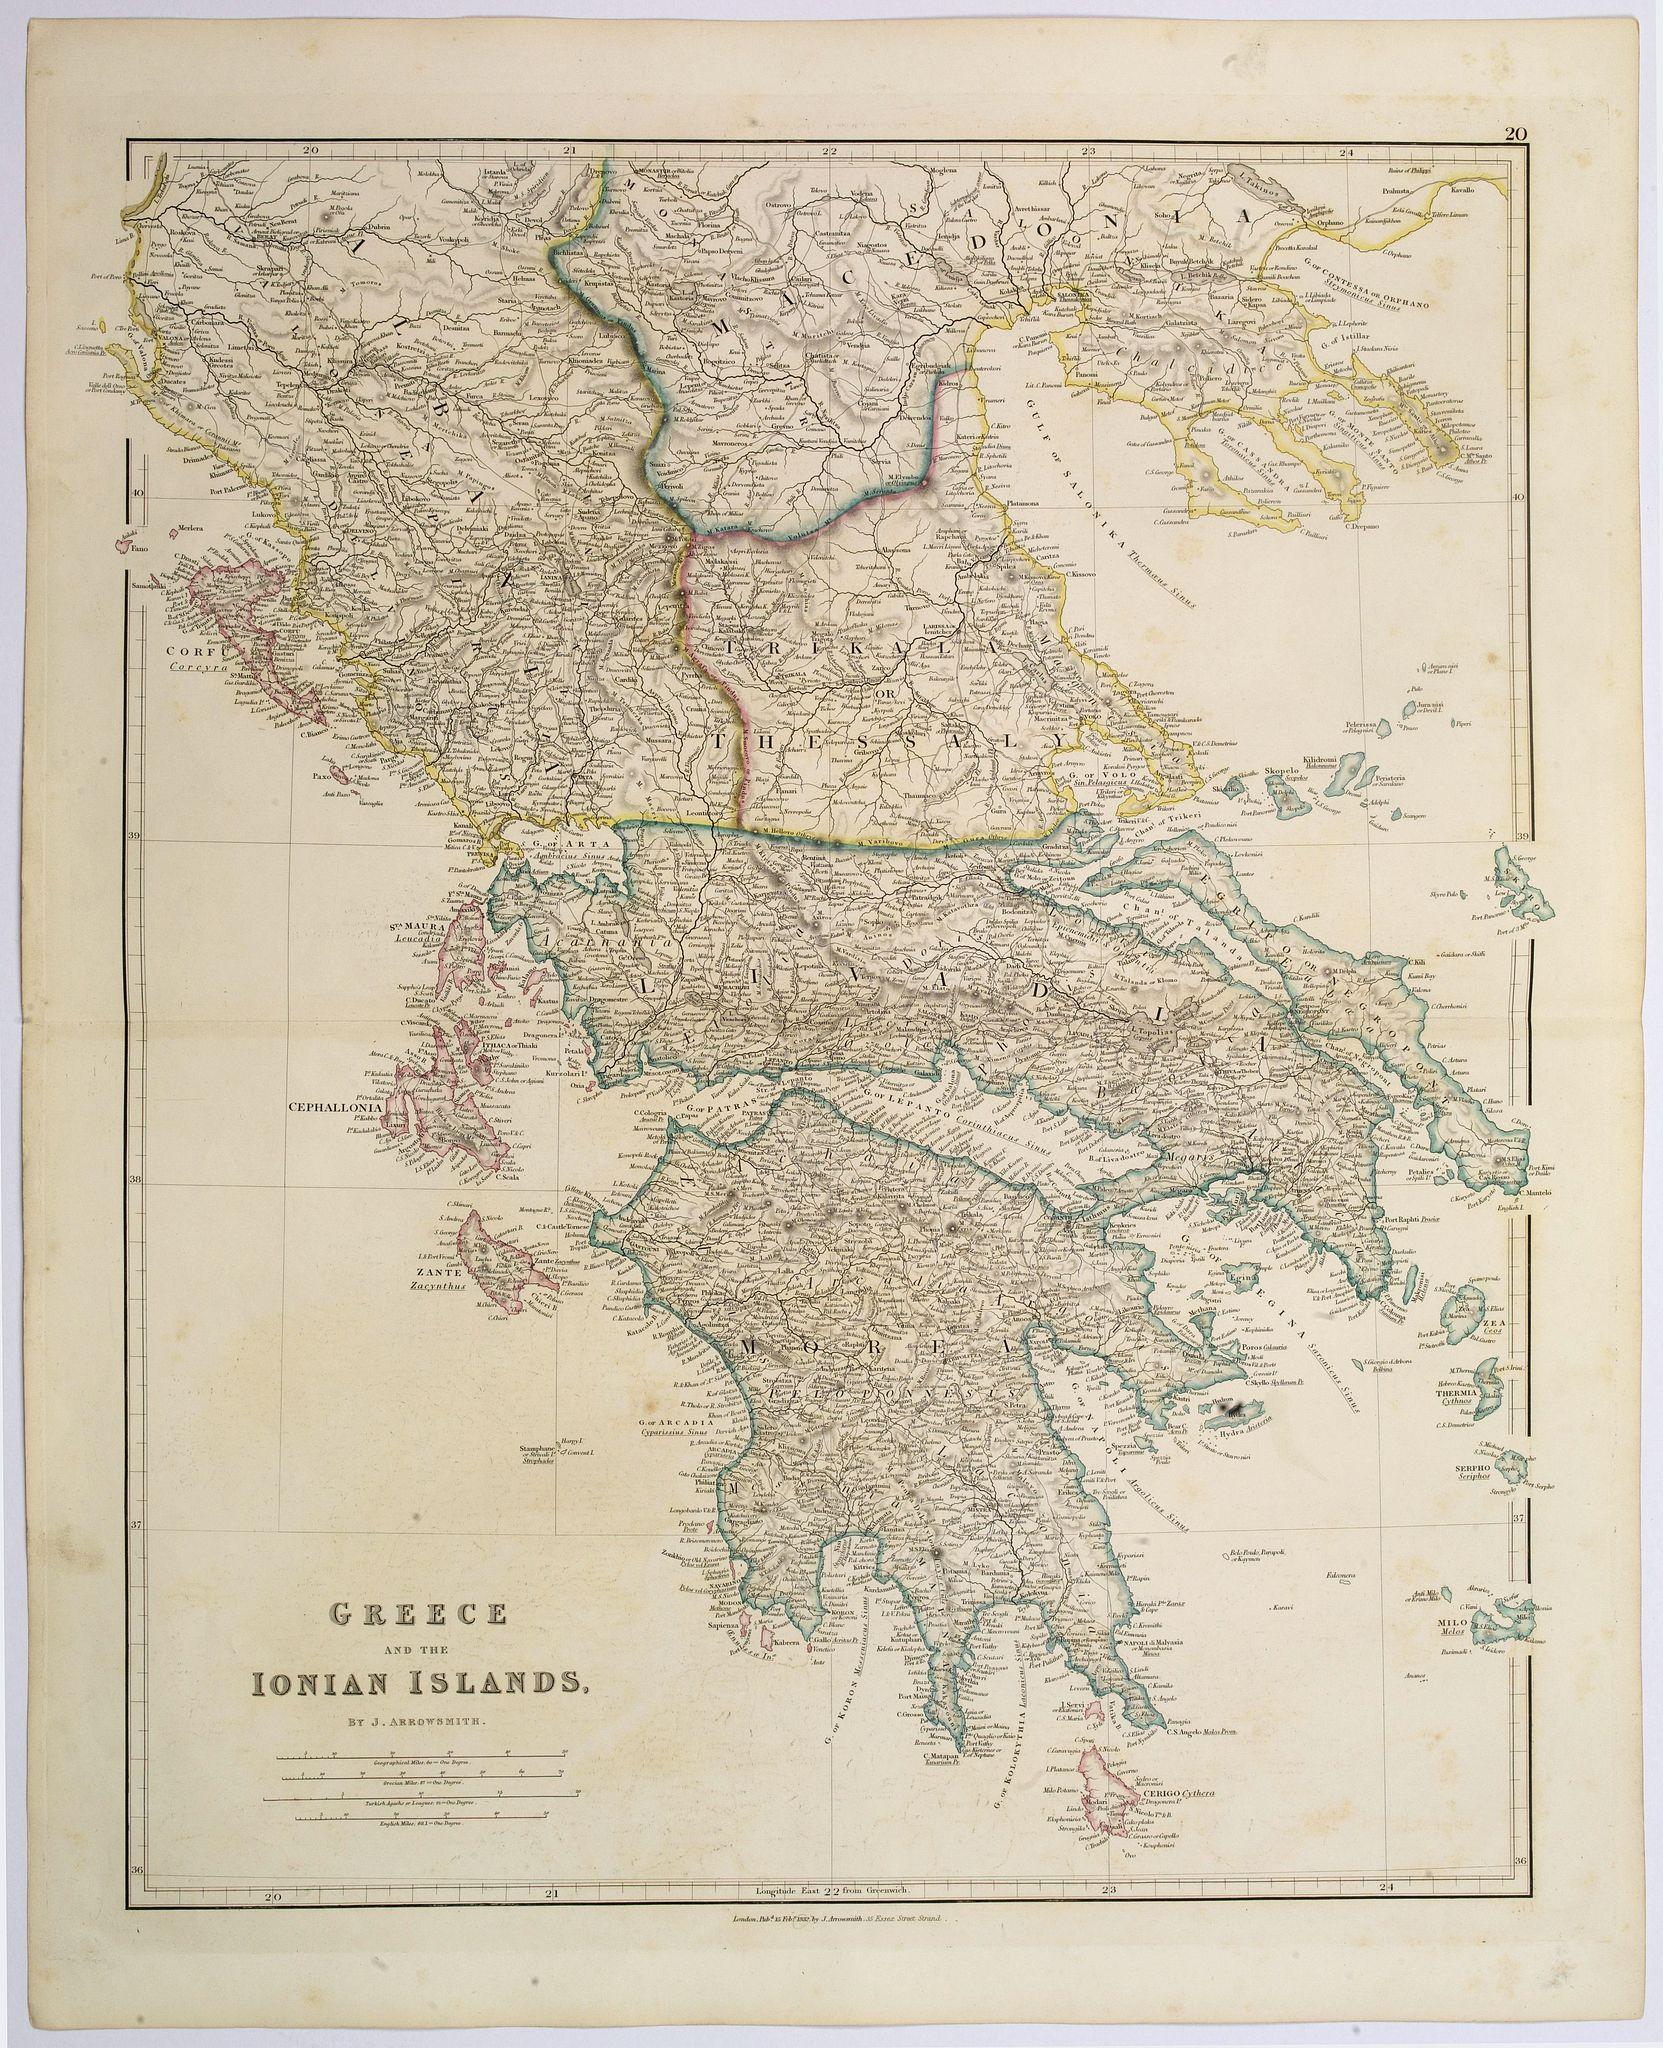 ARROWSMITH, John -  Greece and the Ionian Islands.